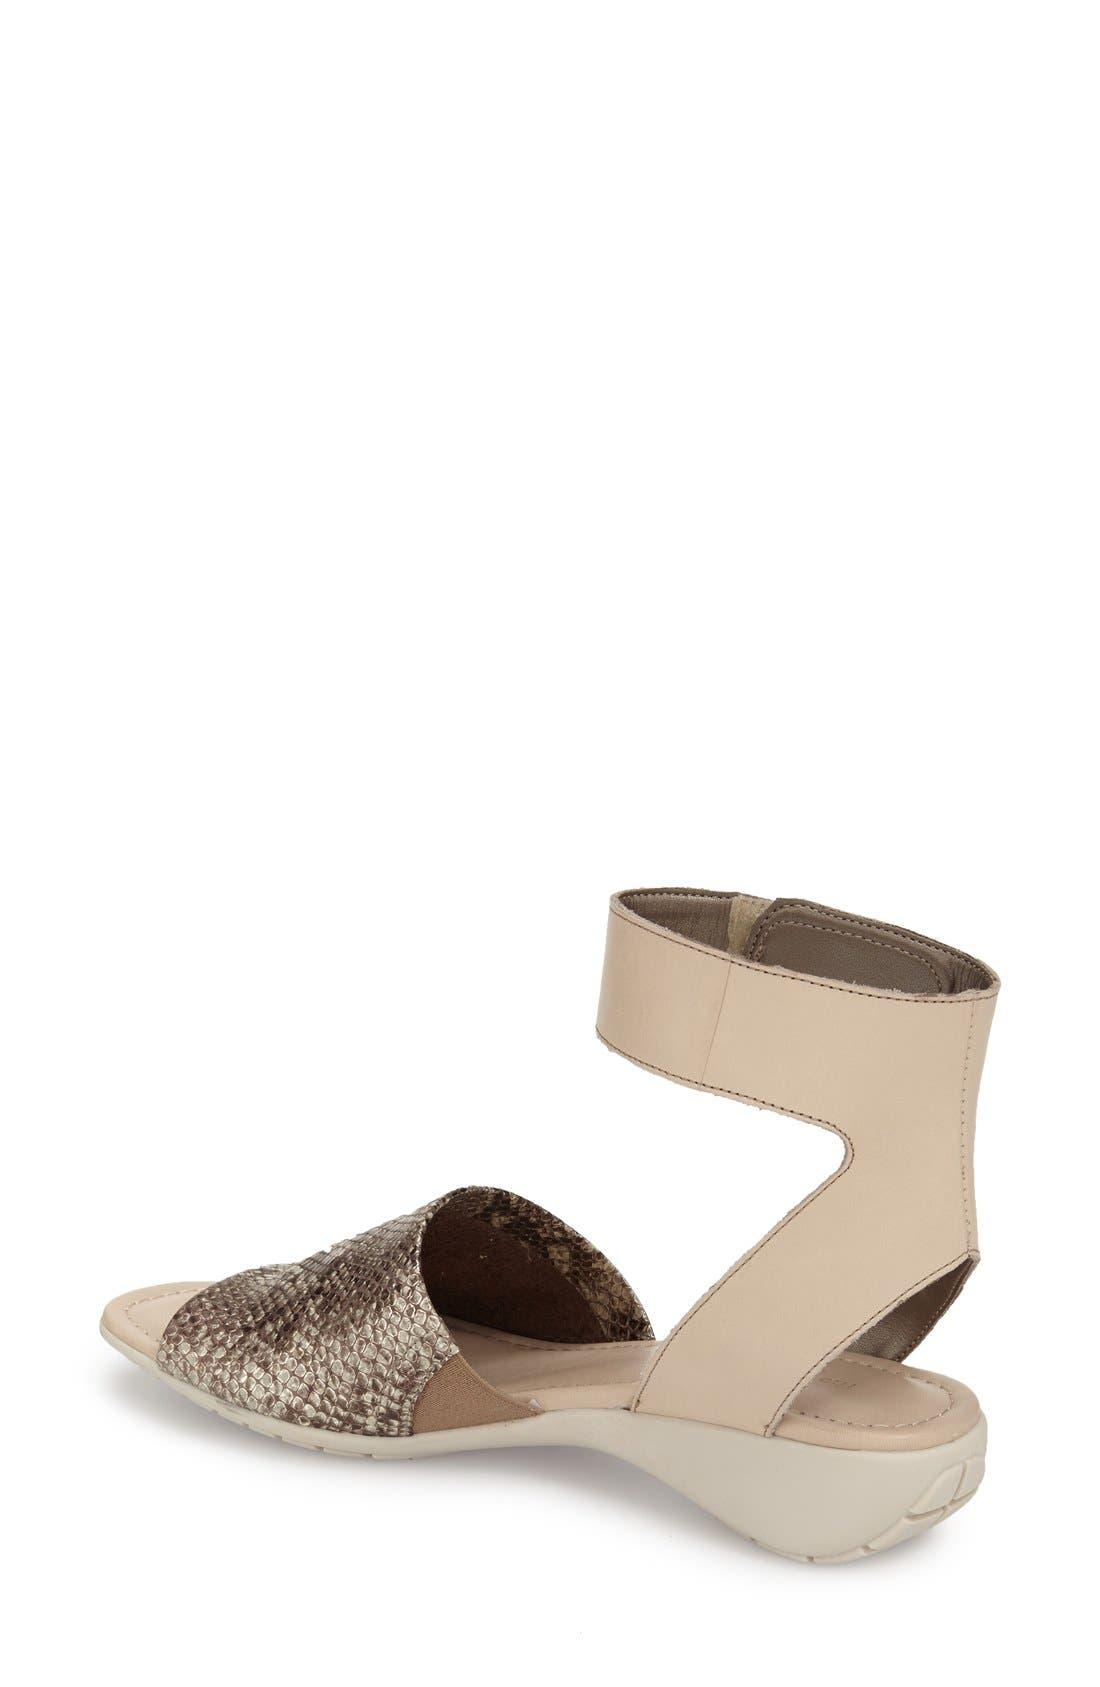 'Beglad' Leather Ankle Strap Sandal,                             Alternate thumbnail 31, color,